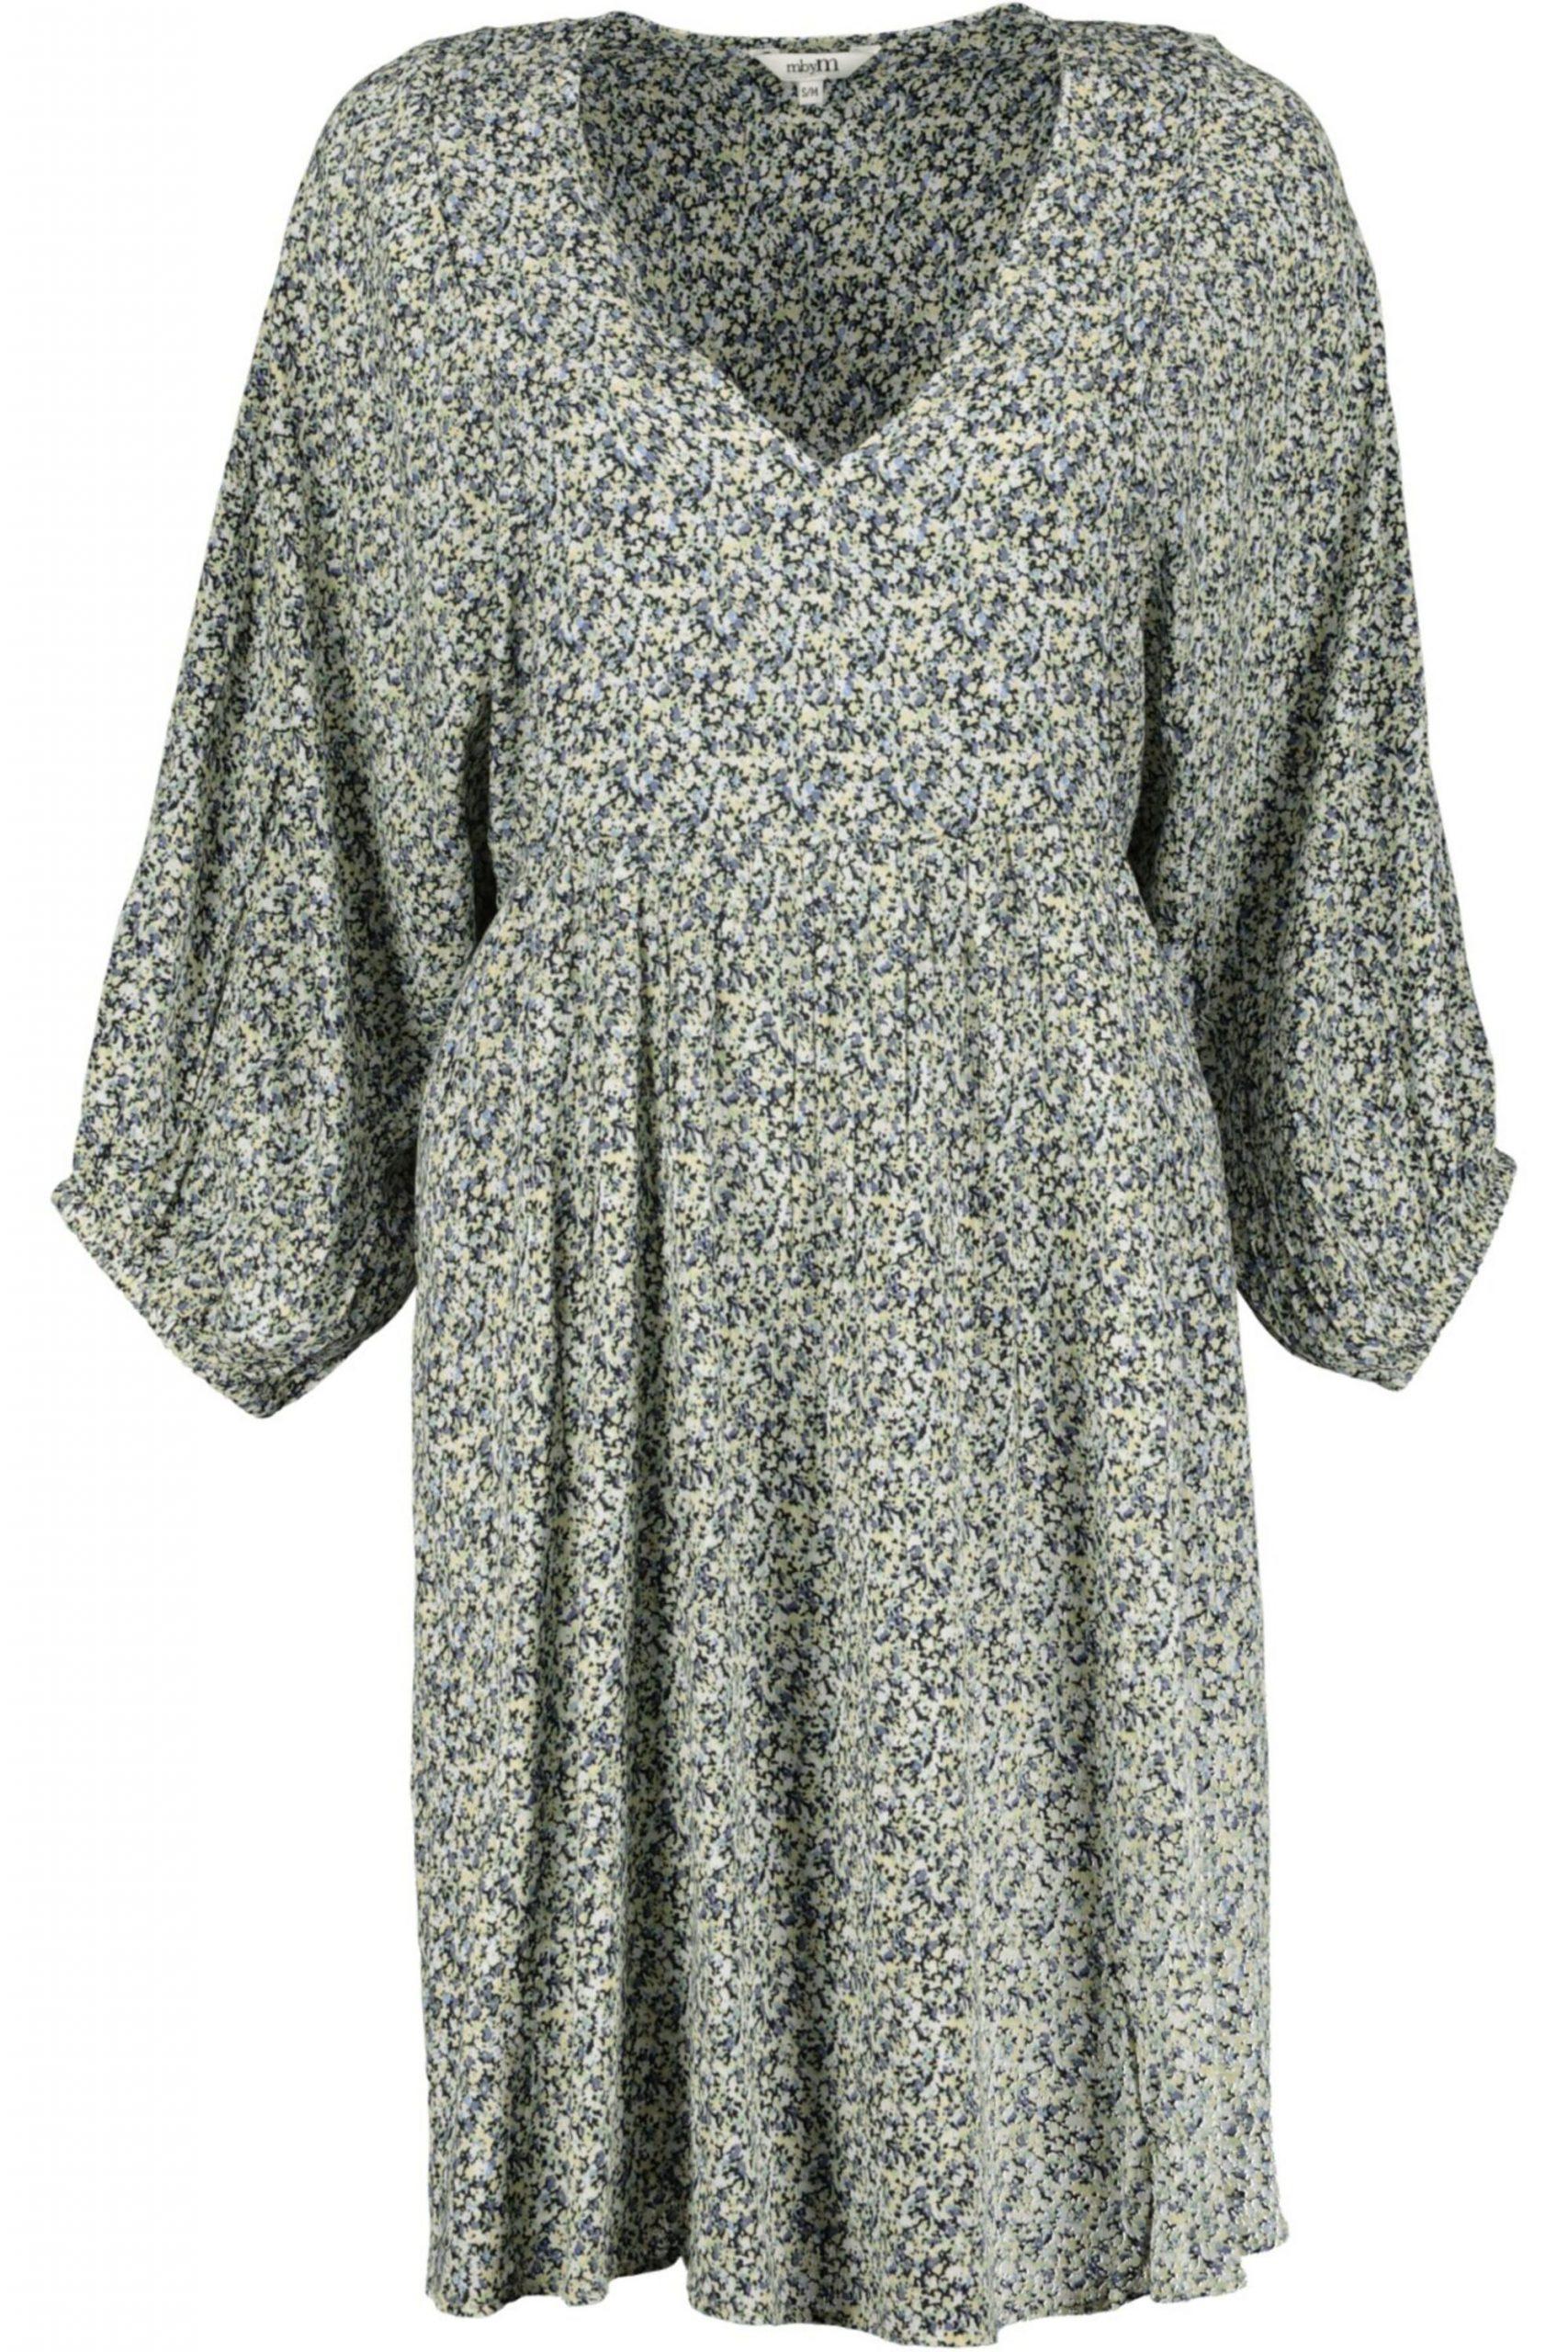 Kleid Dortea  Mbym Bei Mode Löning